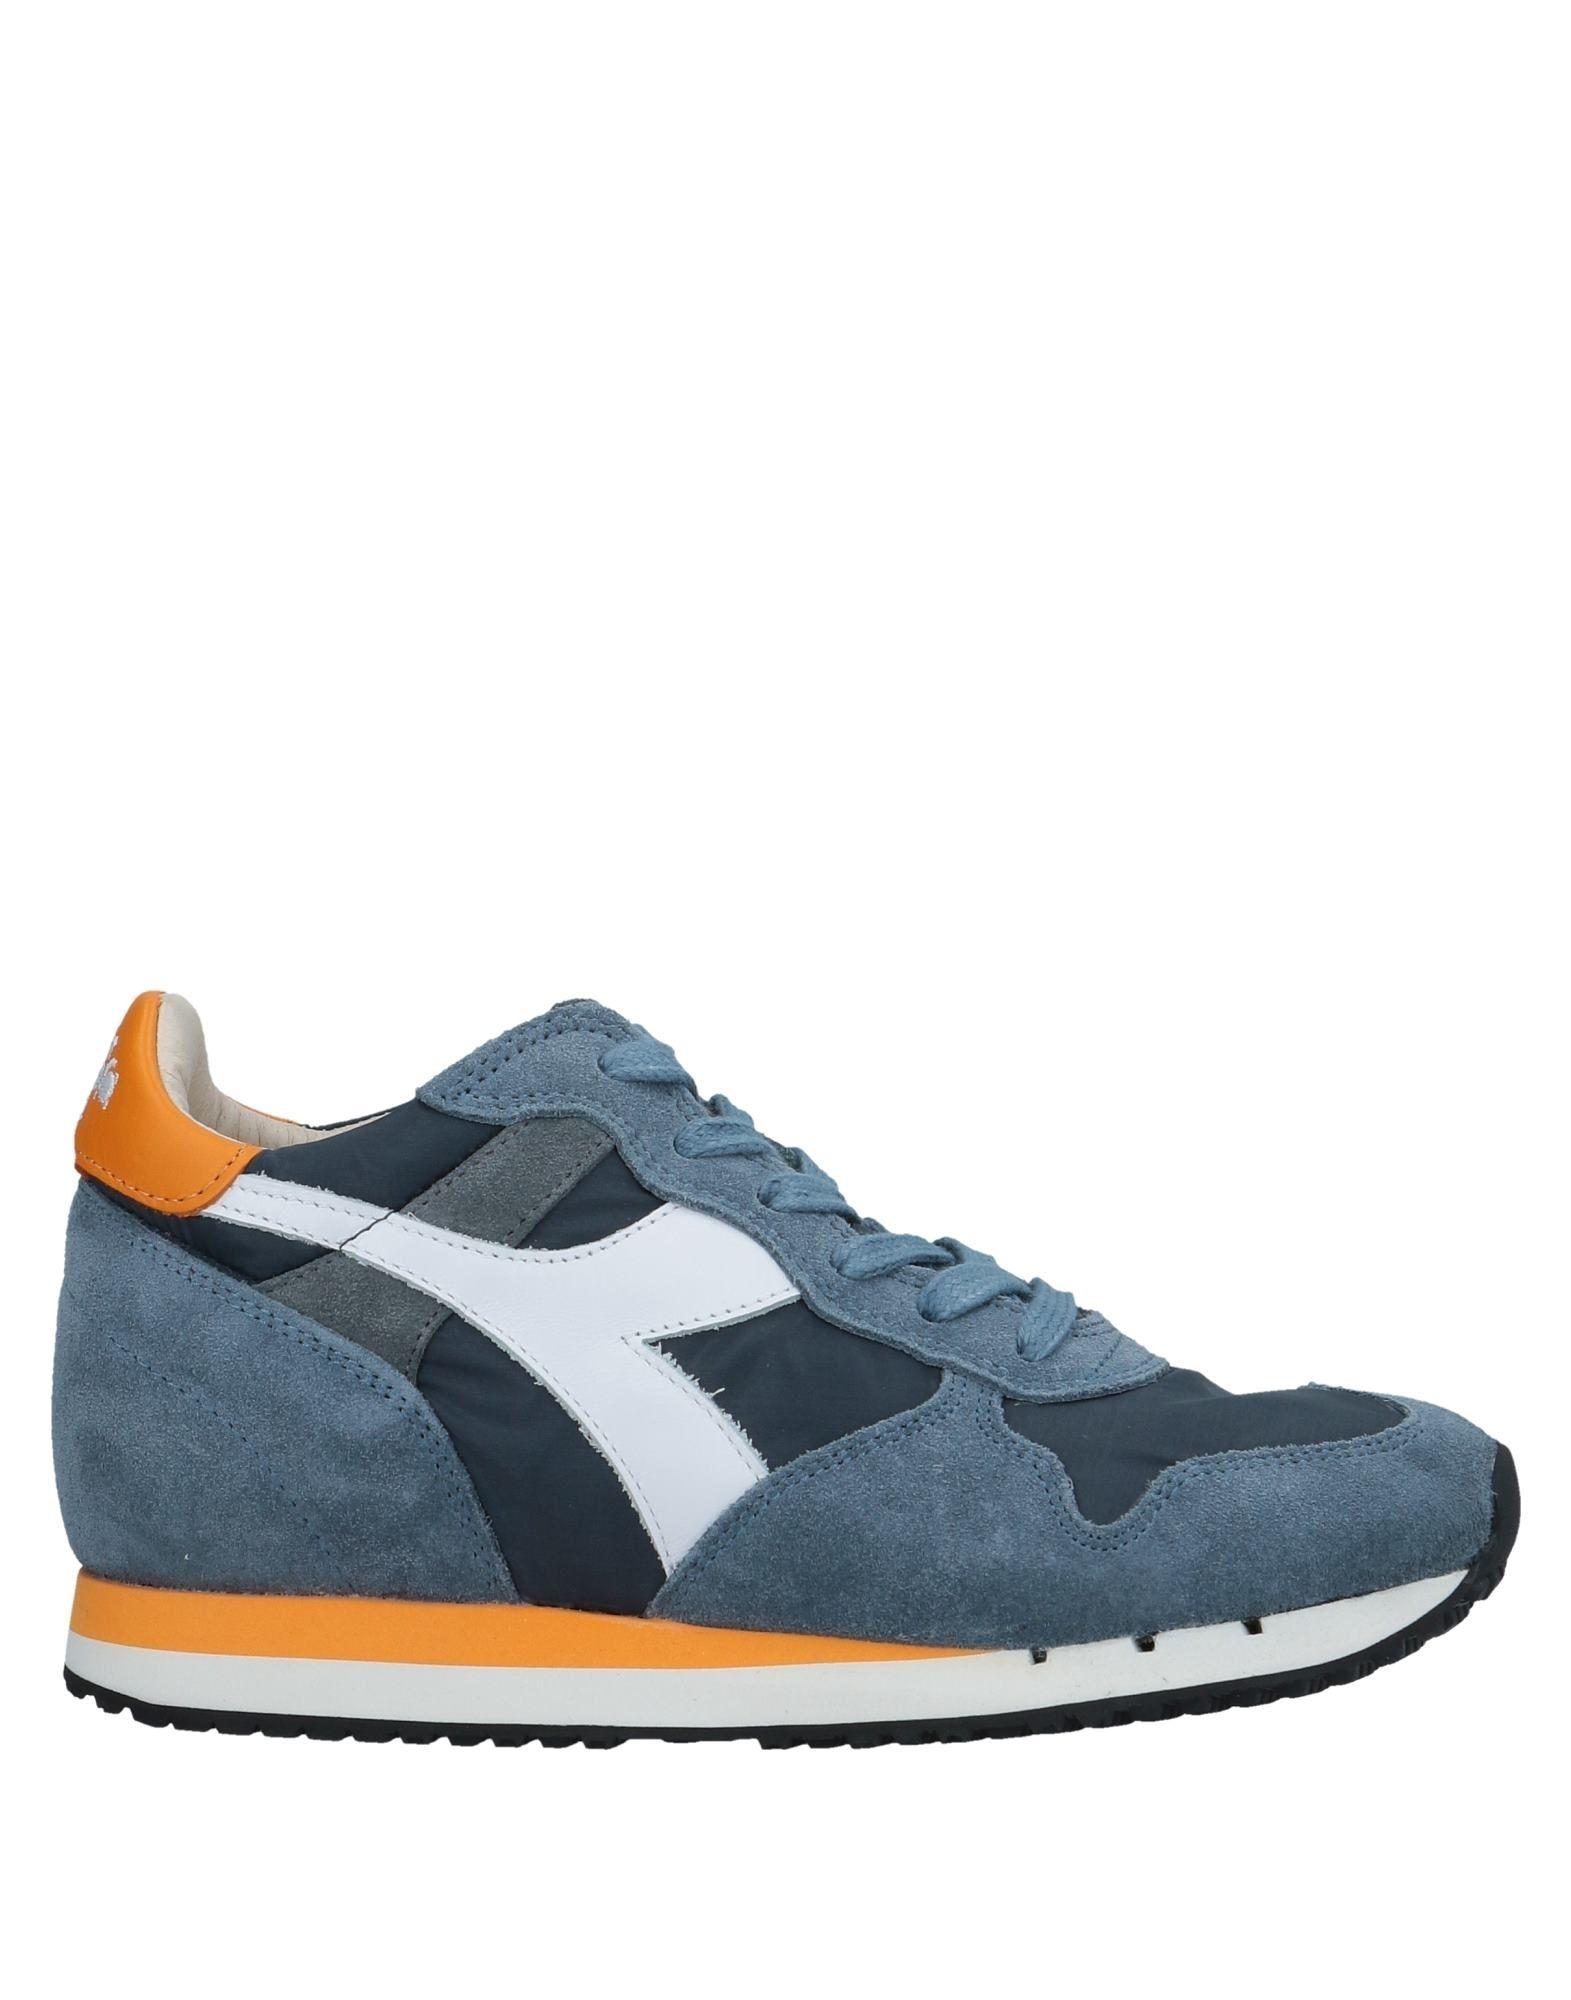 Diadora Heritage Sneakers Damen  11508333EB Gute Qualität beliebte Schuhe